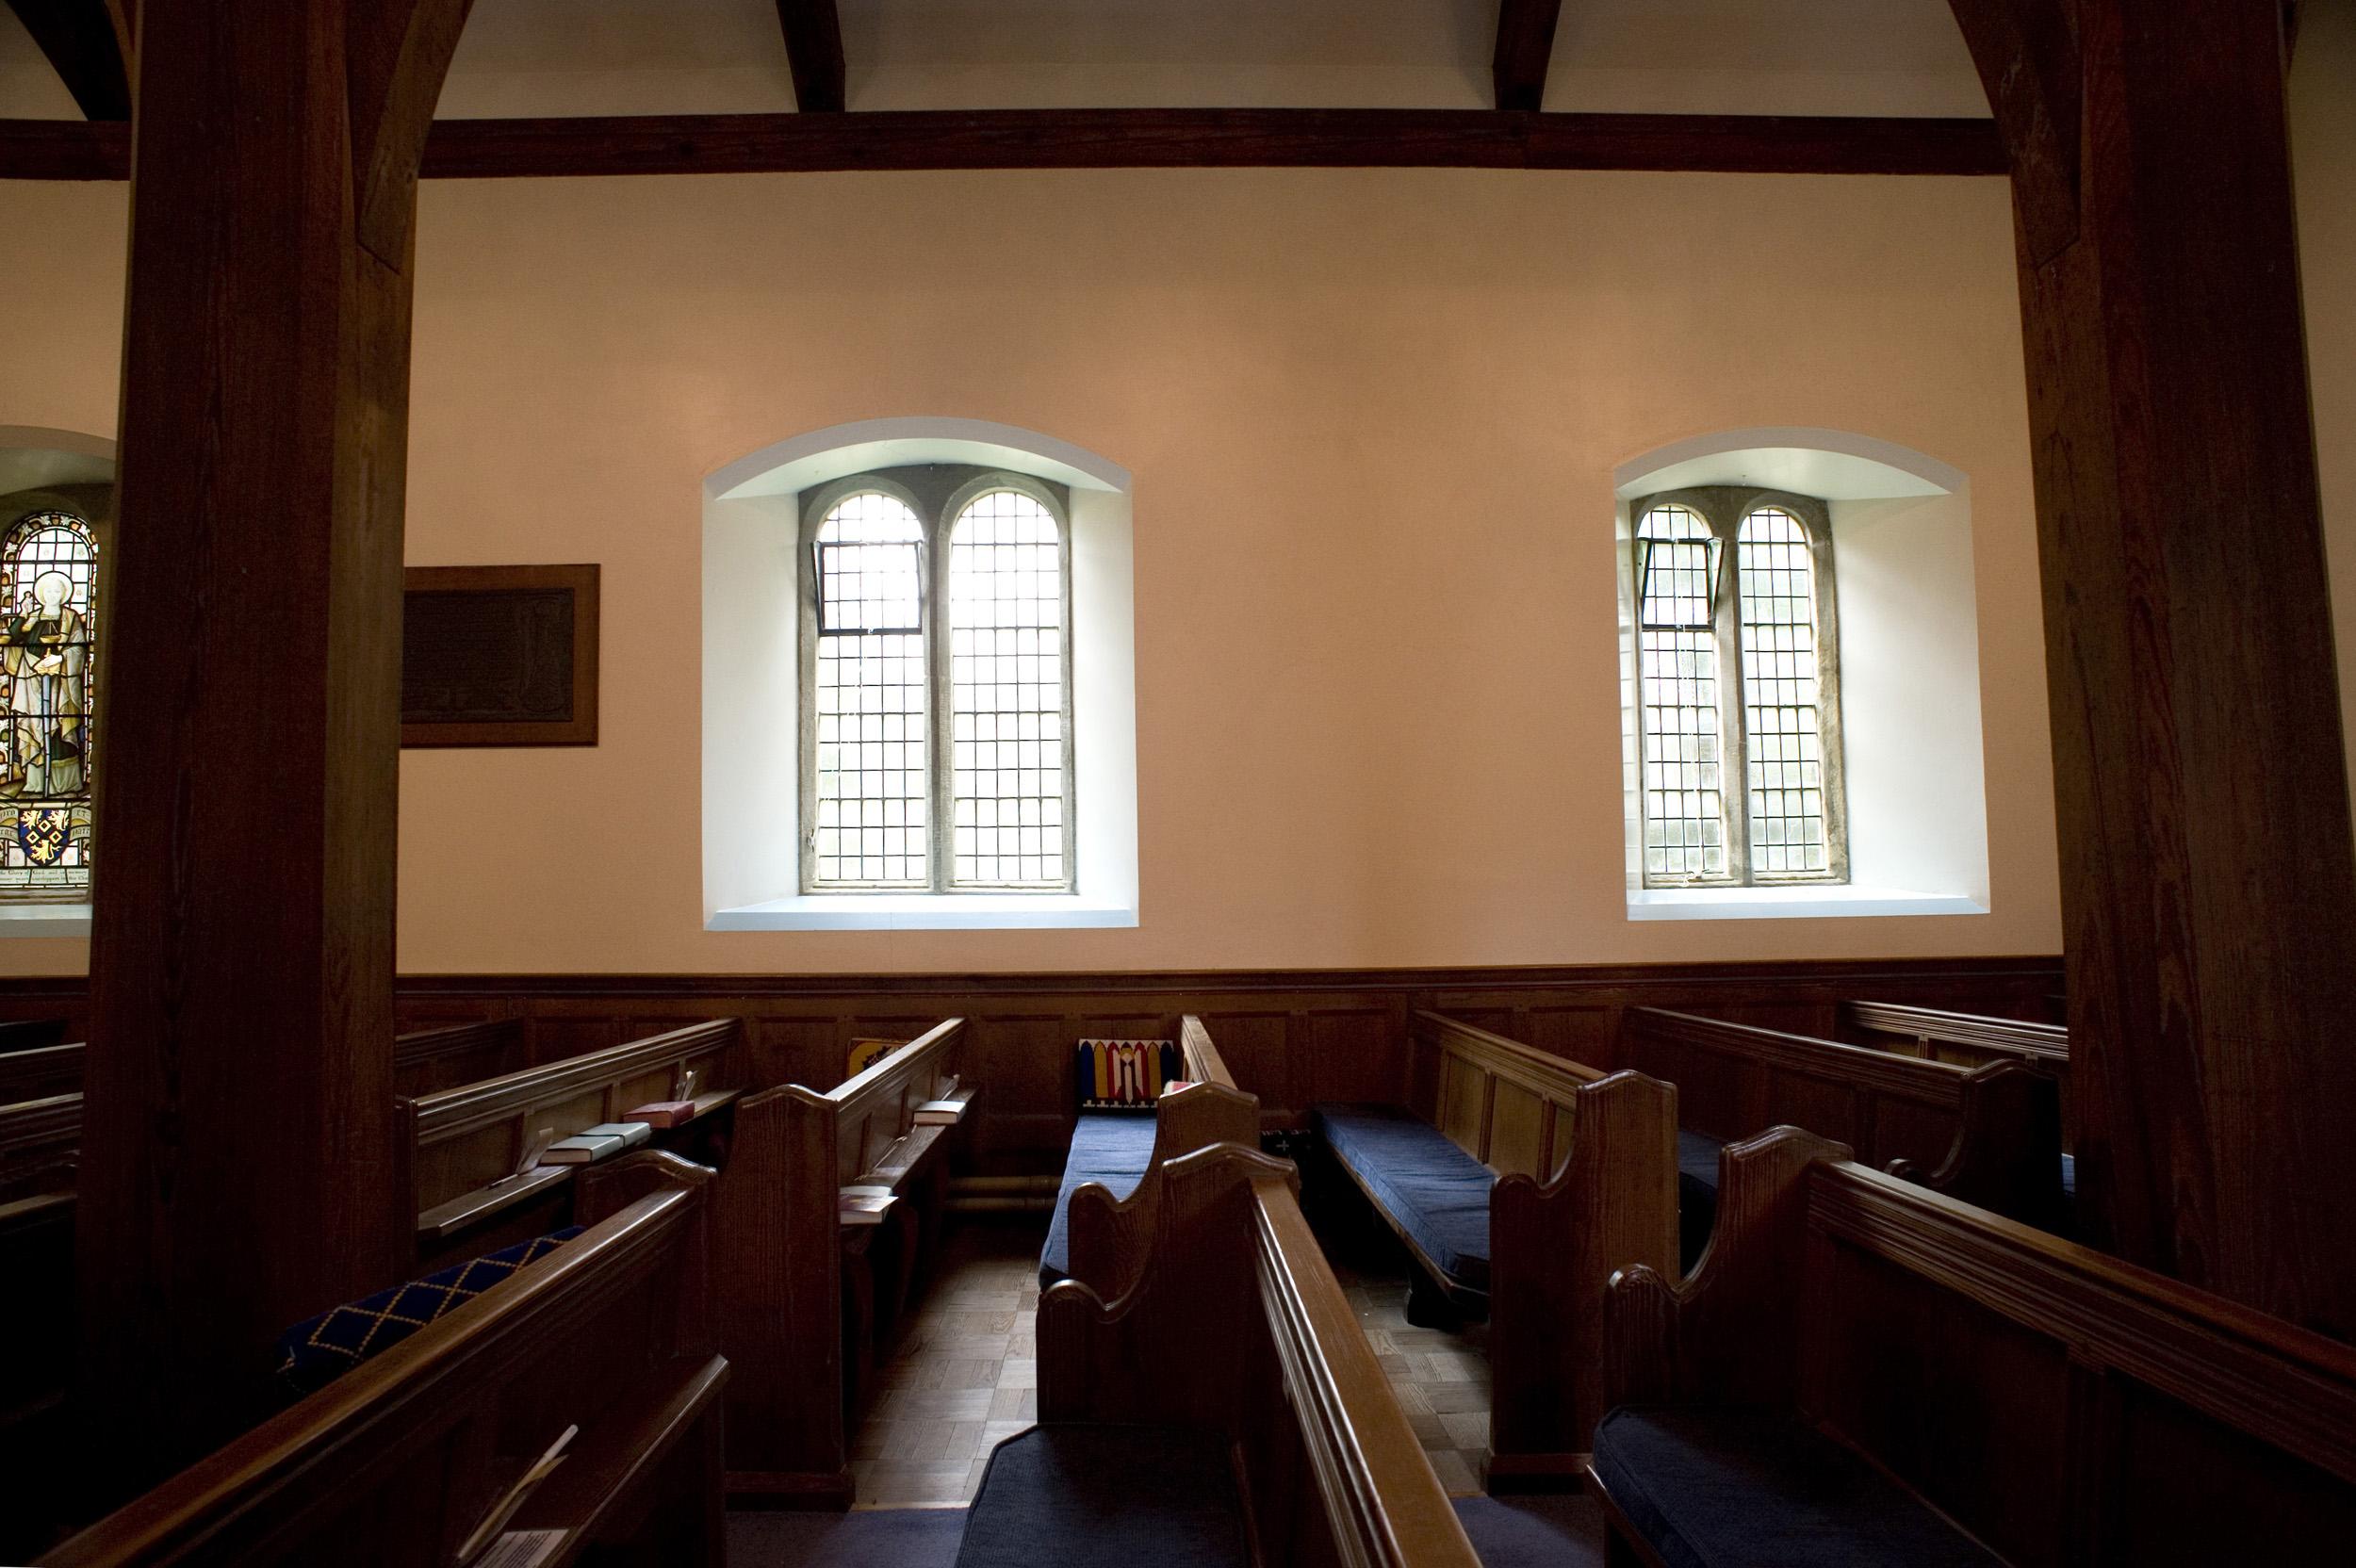 Empty Church Pews Creative Commons Stock Image